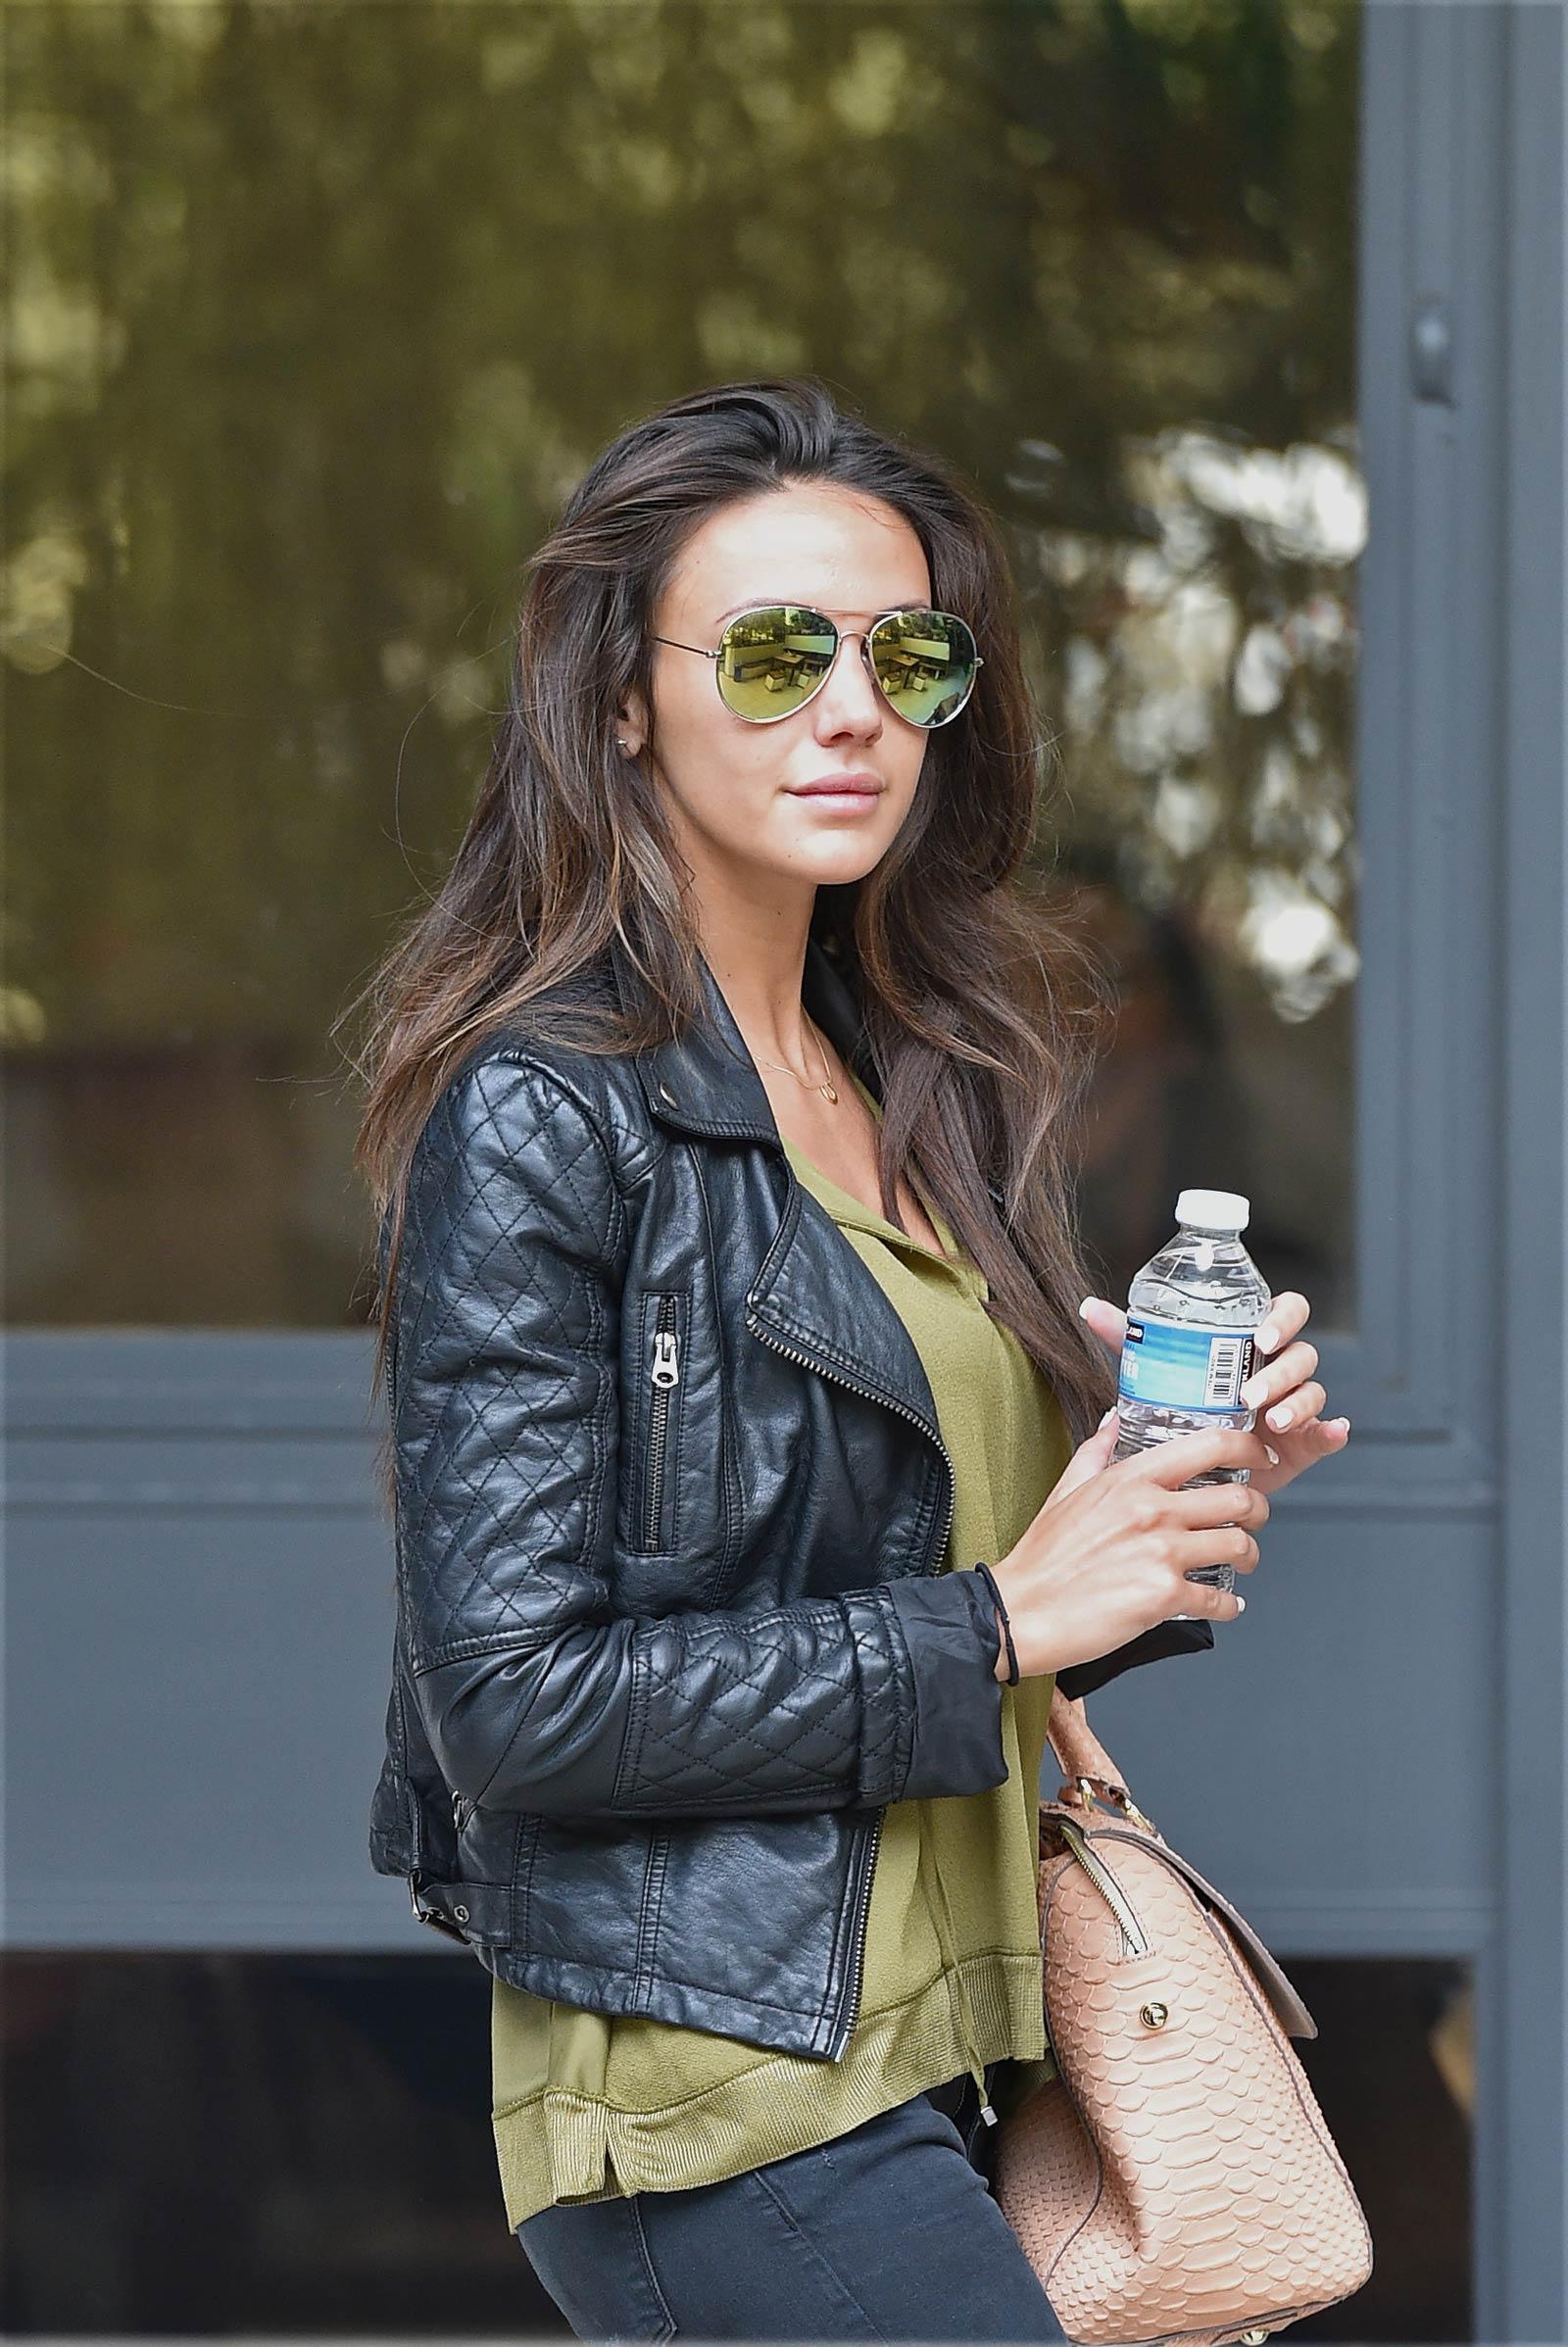 Michelle Keegan seen outside leaving the London Studios